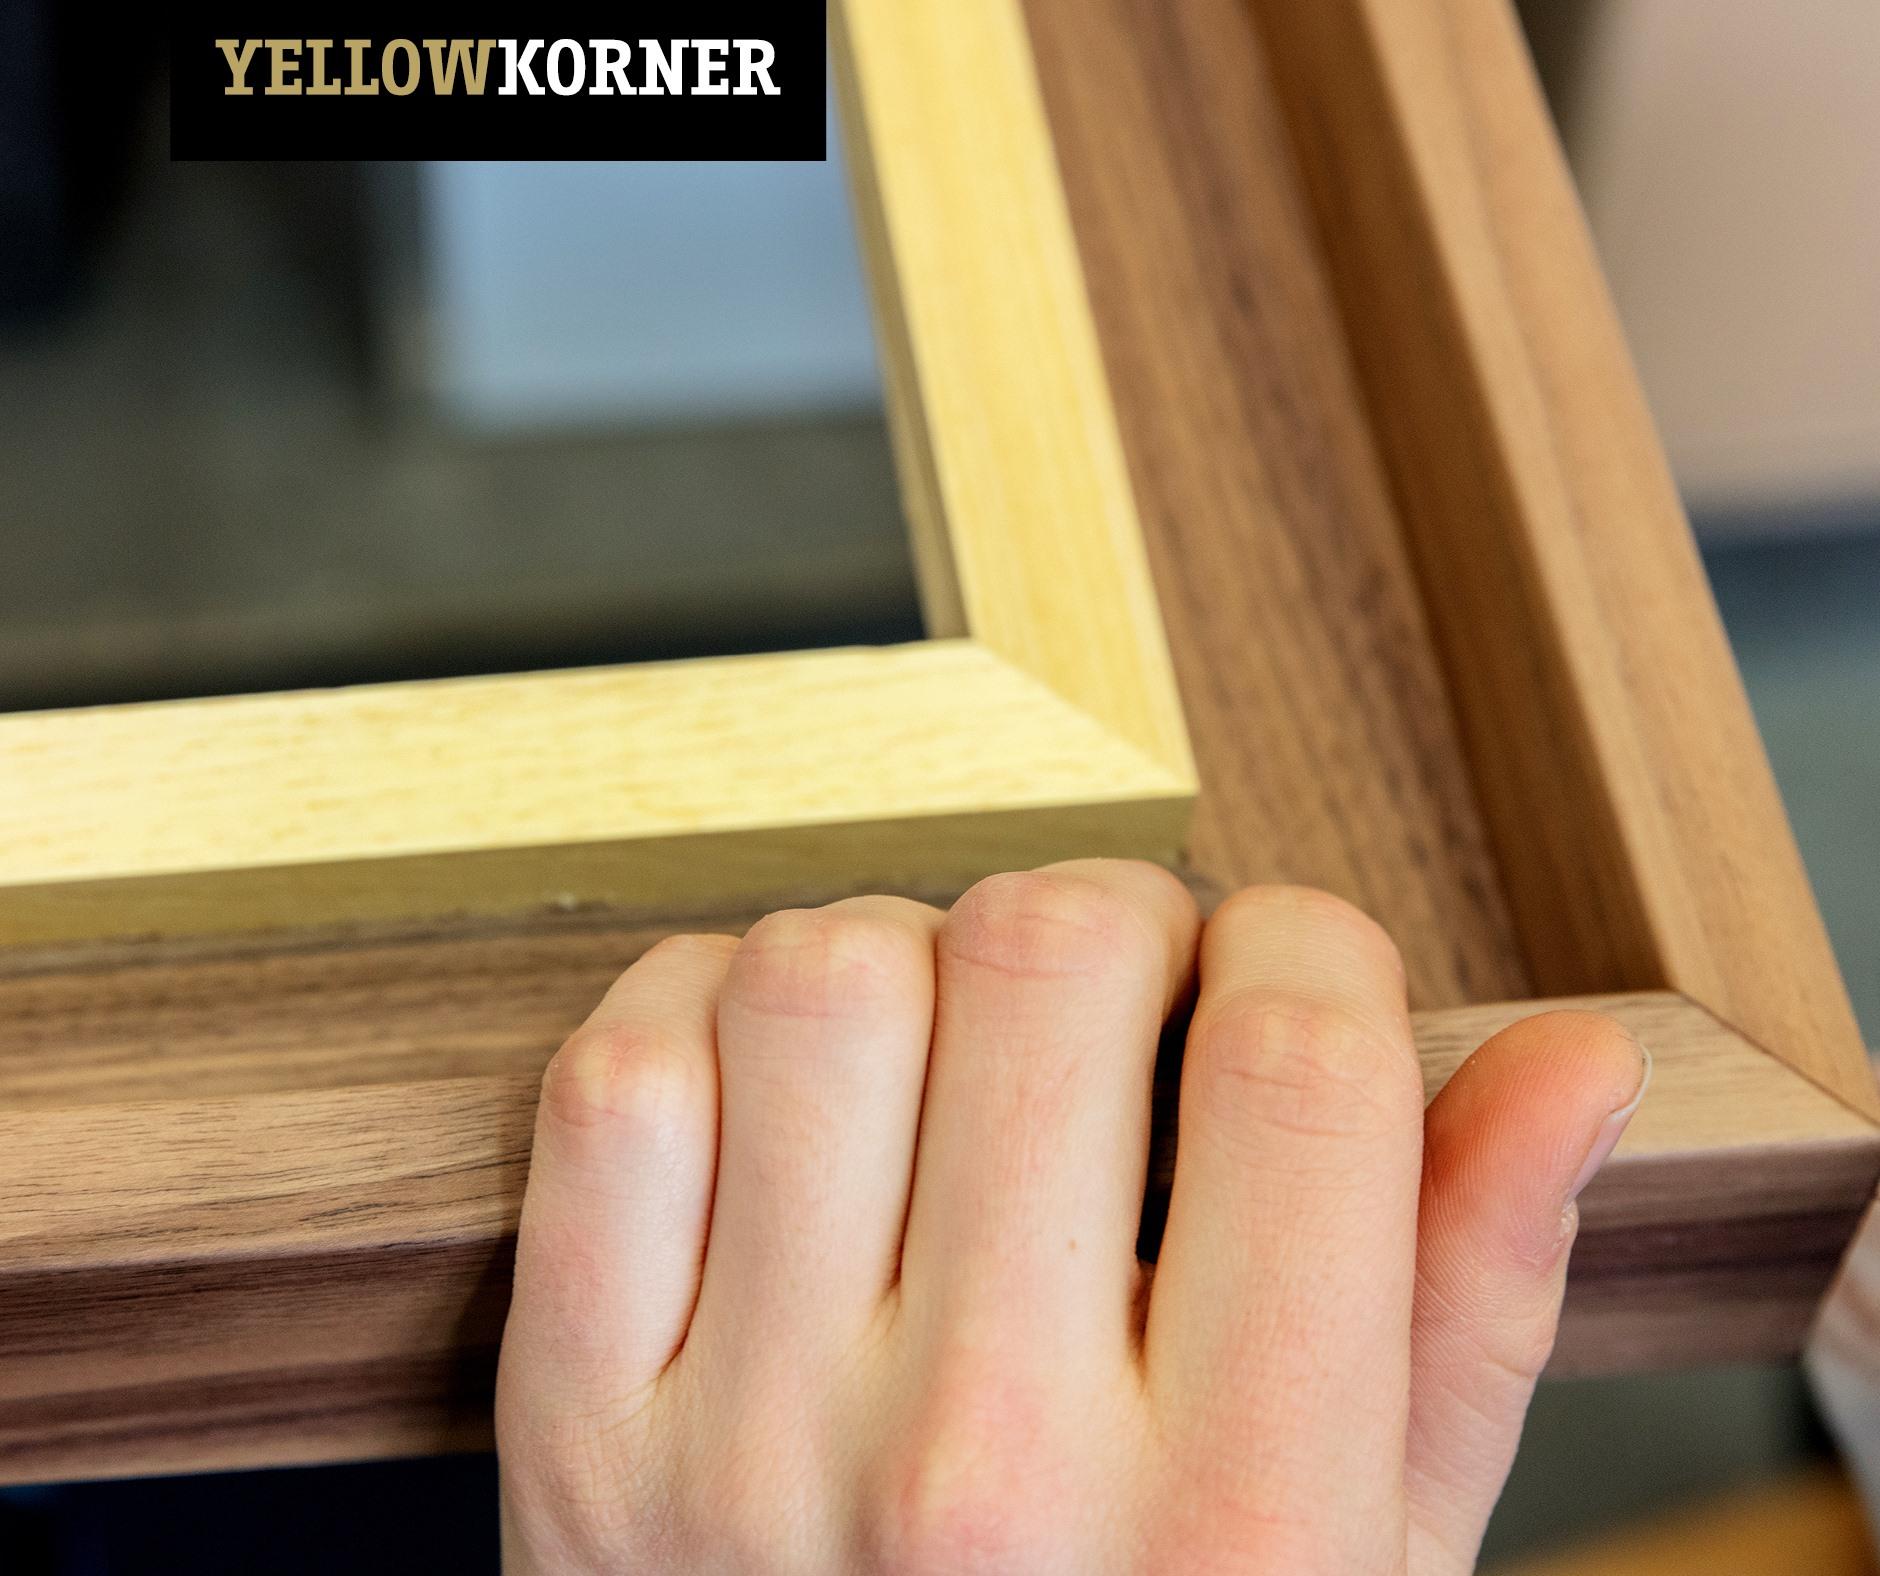 Yellowkorner – encadrement d'images d'art – Dealabs